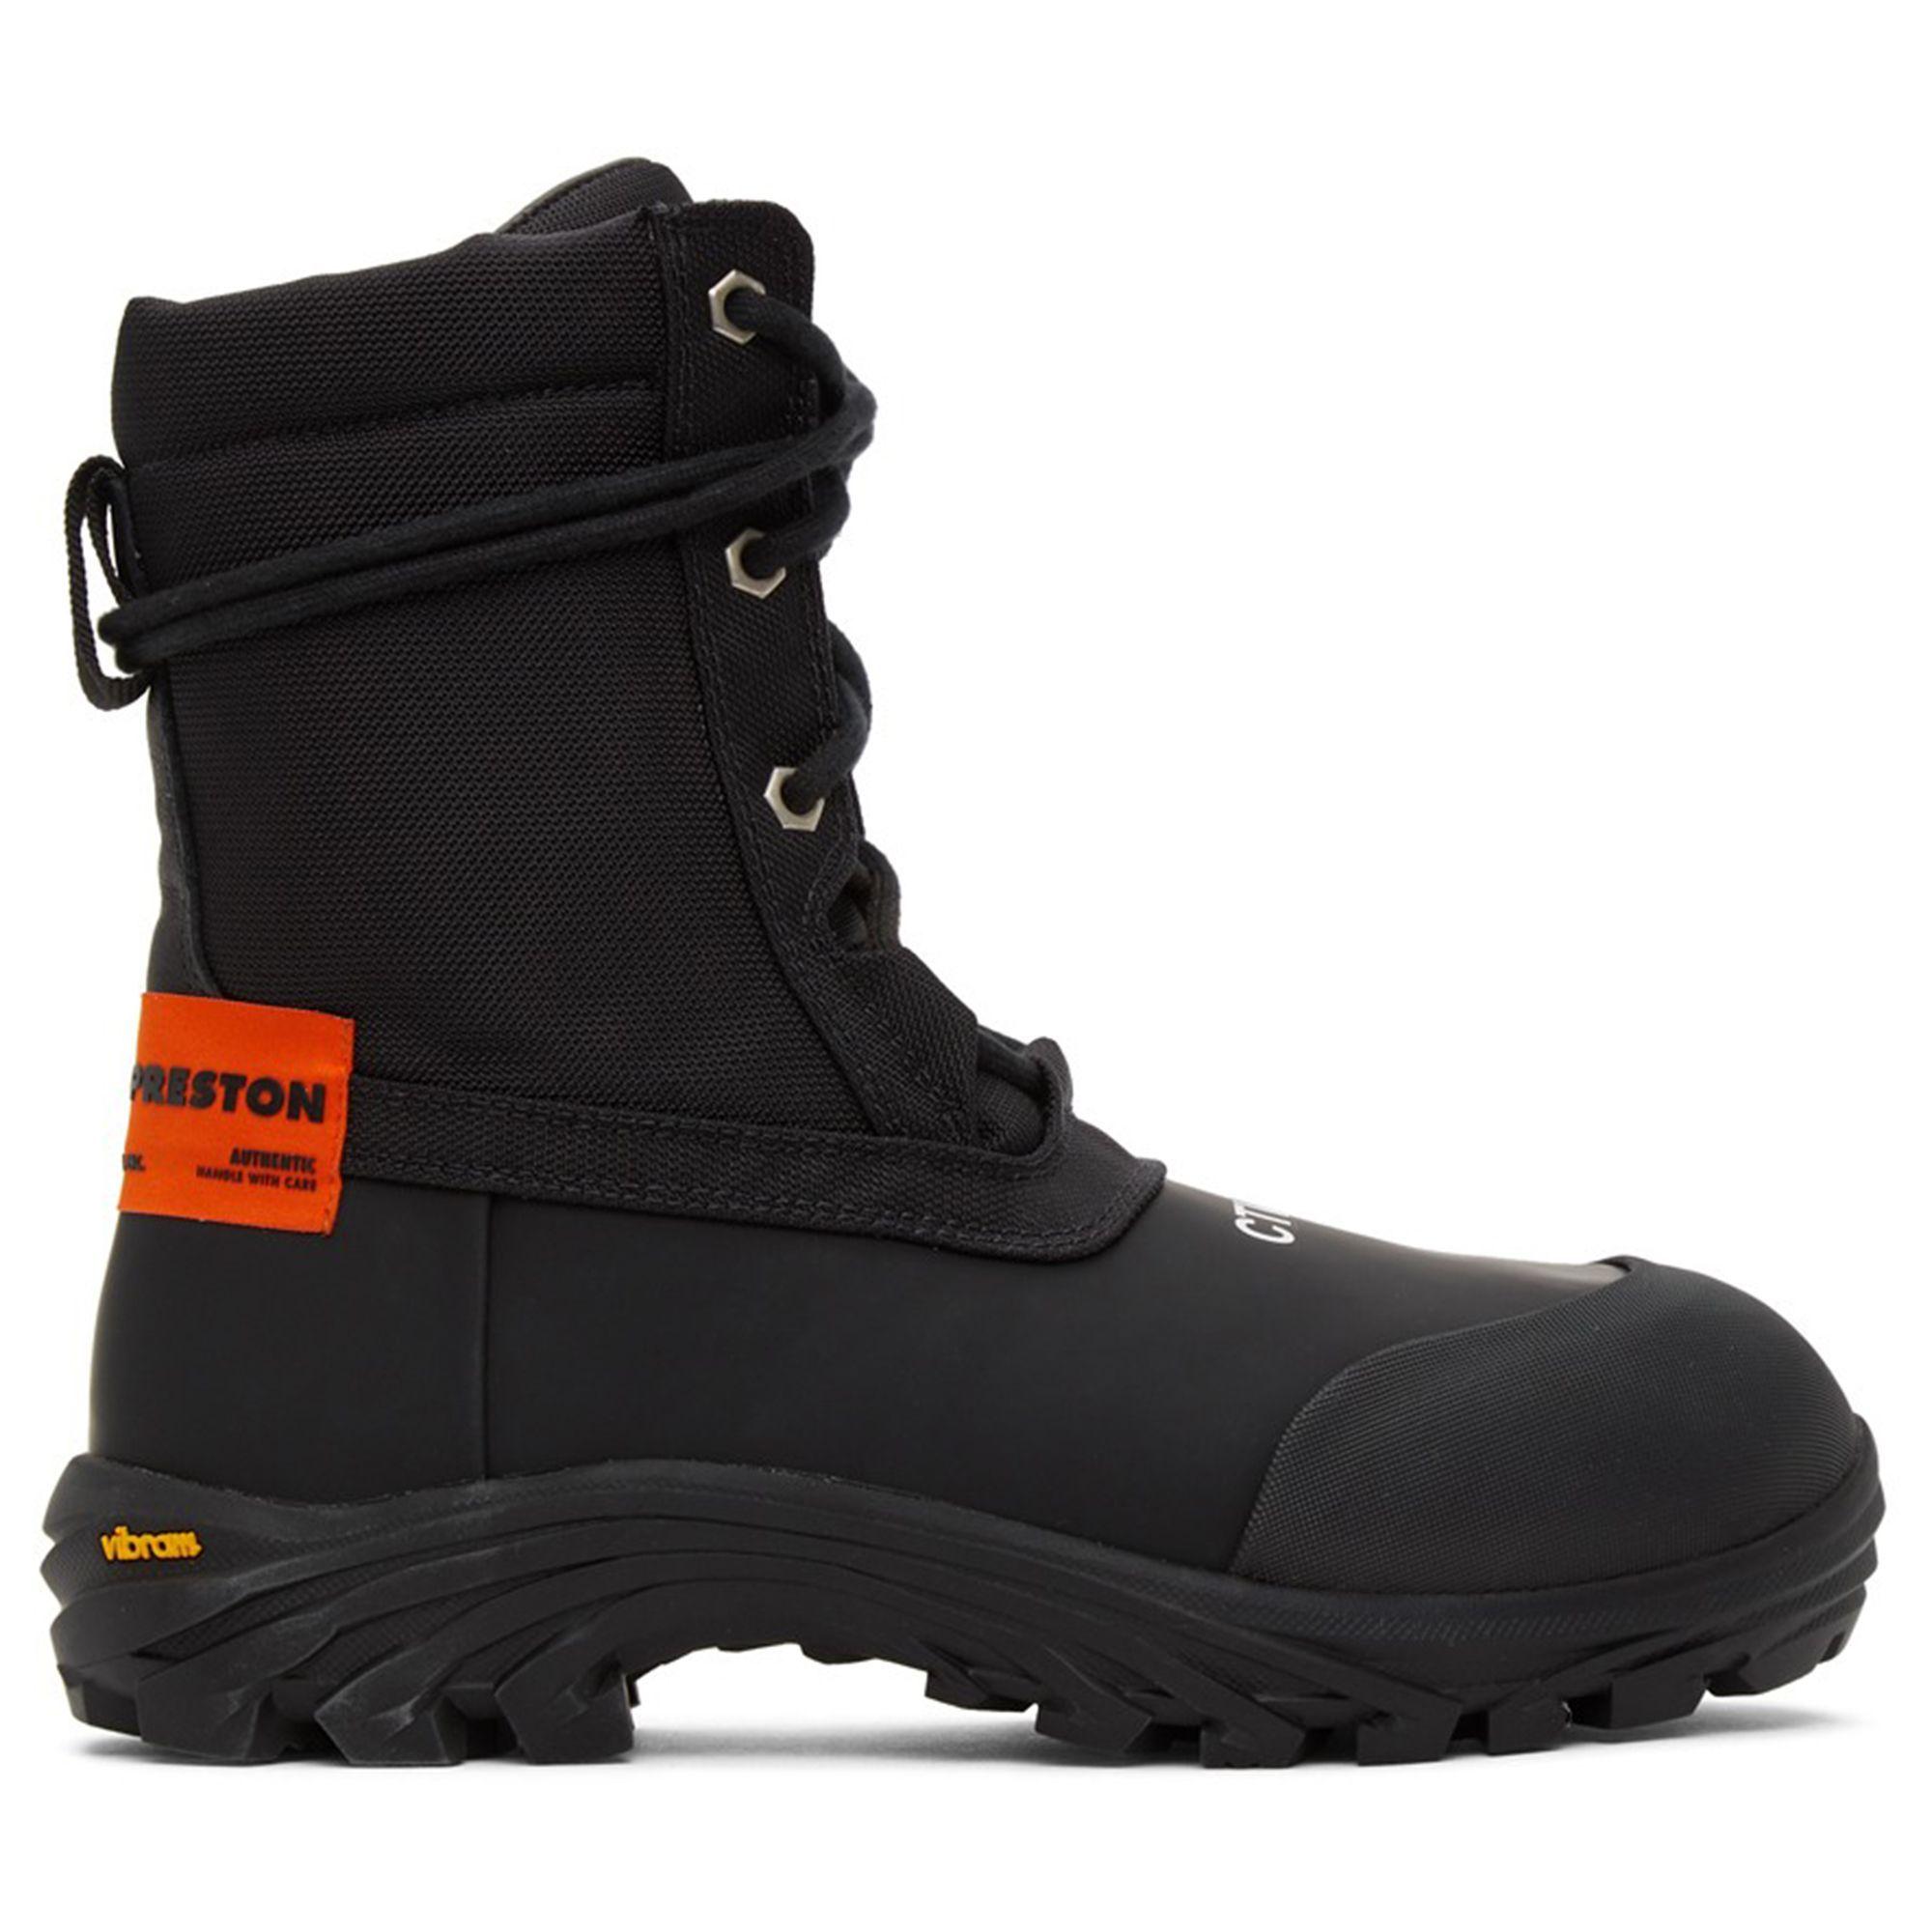 15 Best Men's Winter Boots 2020 - Most